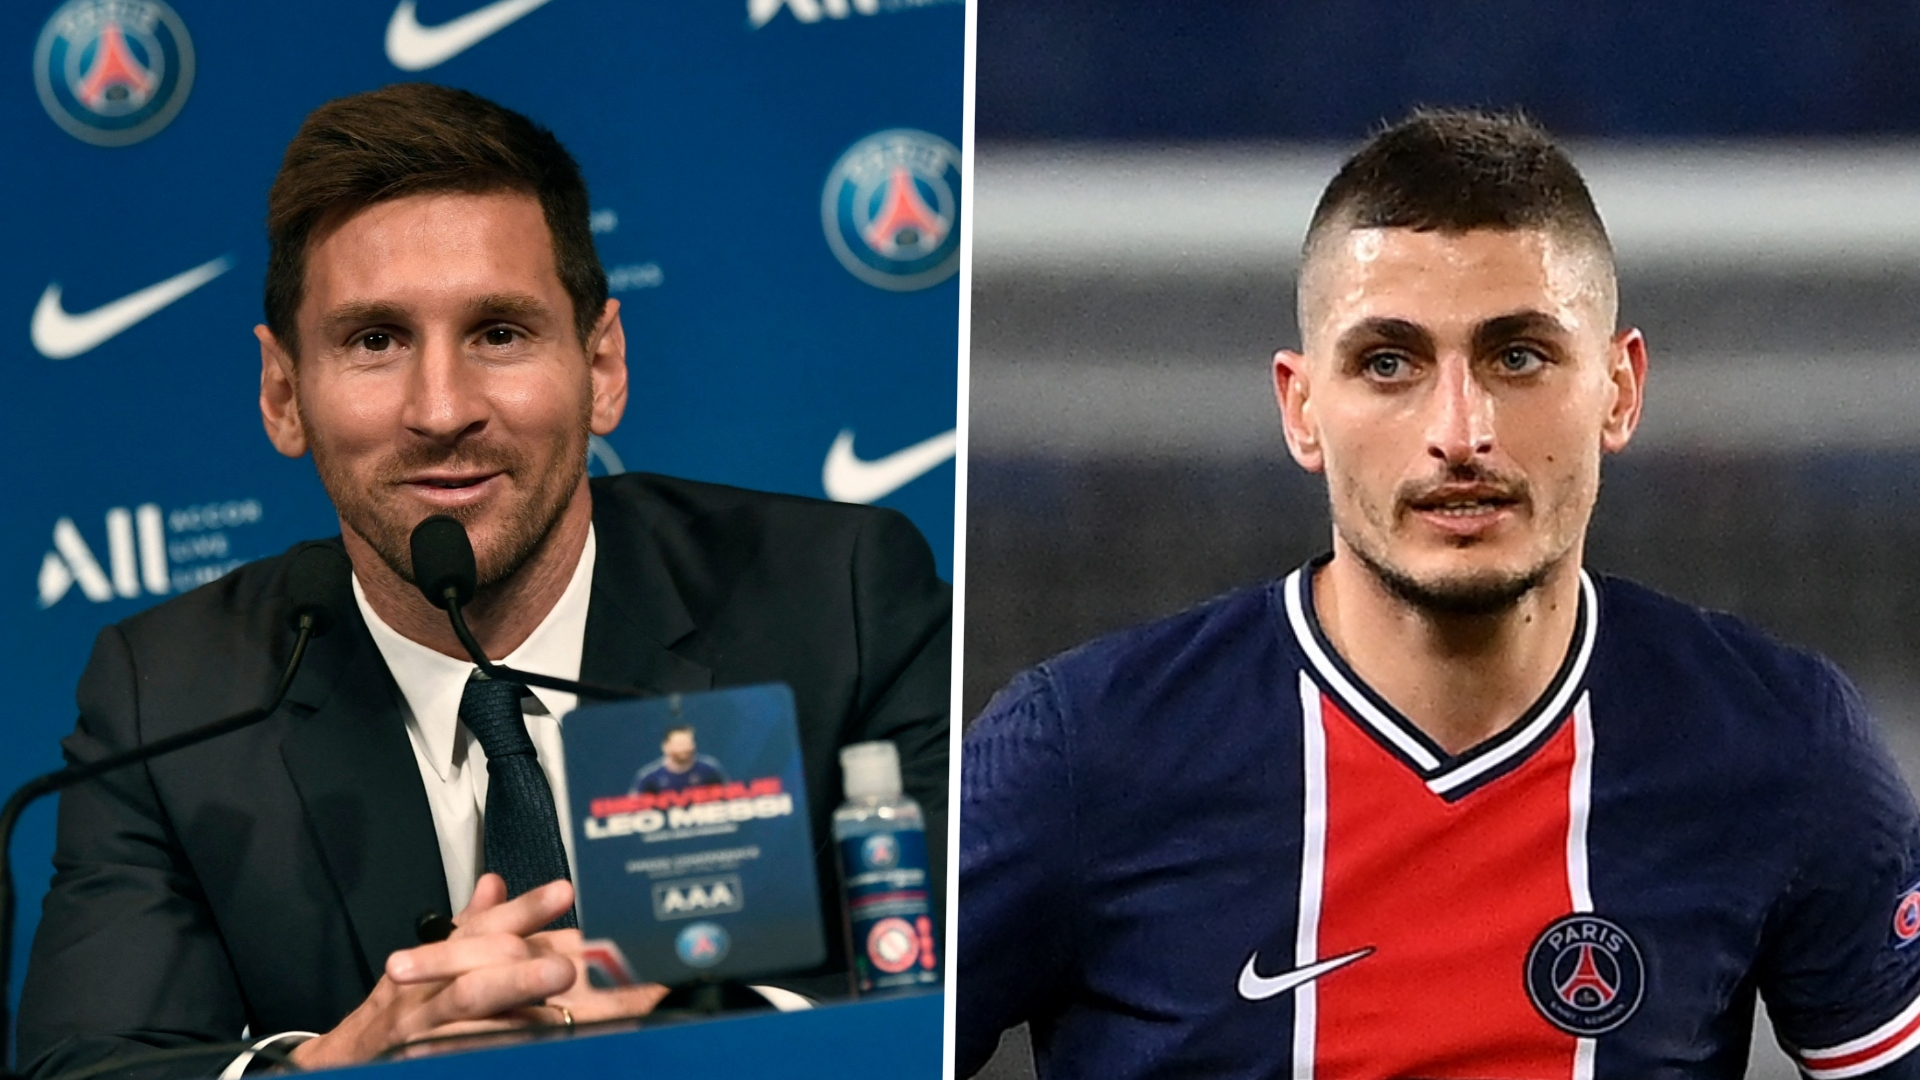 'Verratti is a phenomenon' - Messi reveals Barcelona wanted to sign PSG star